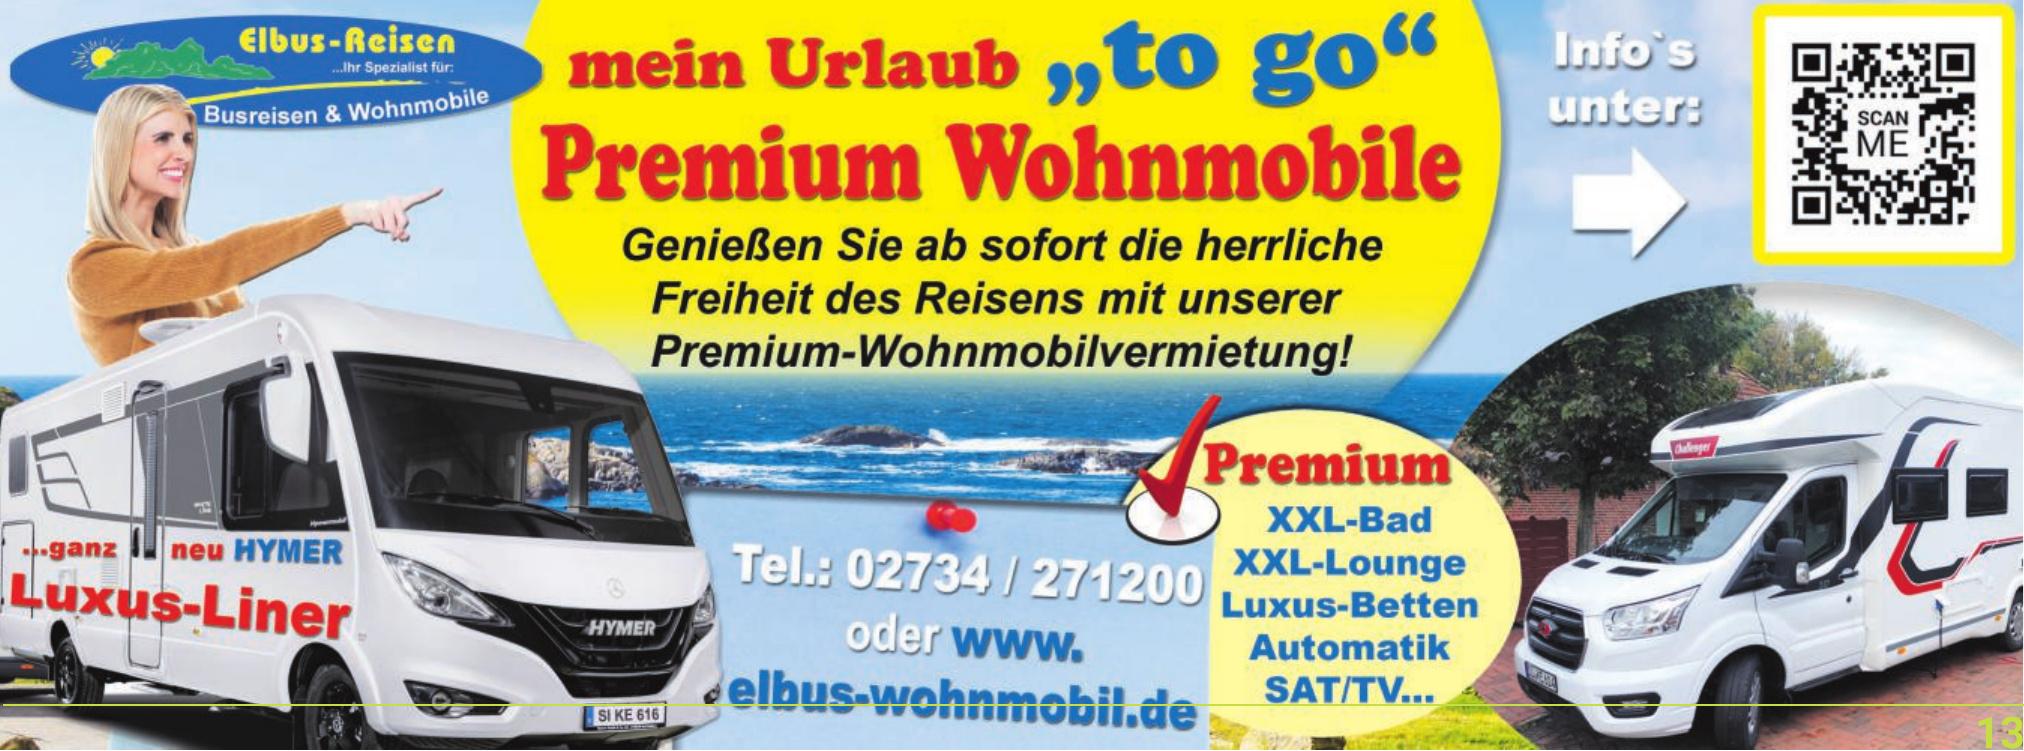 Elbus-Reisen